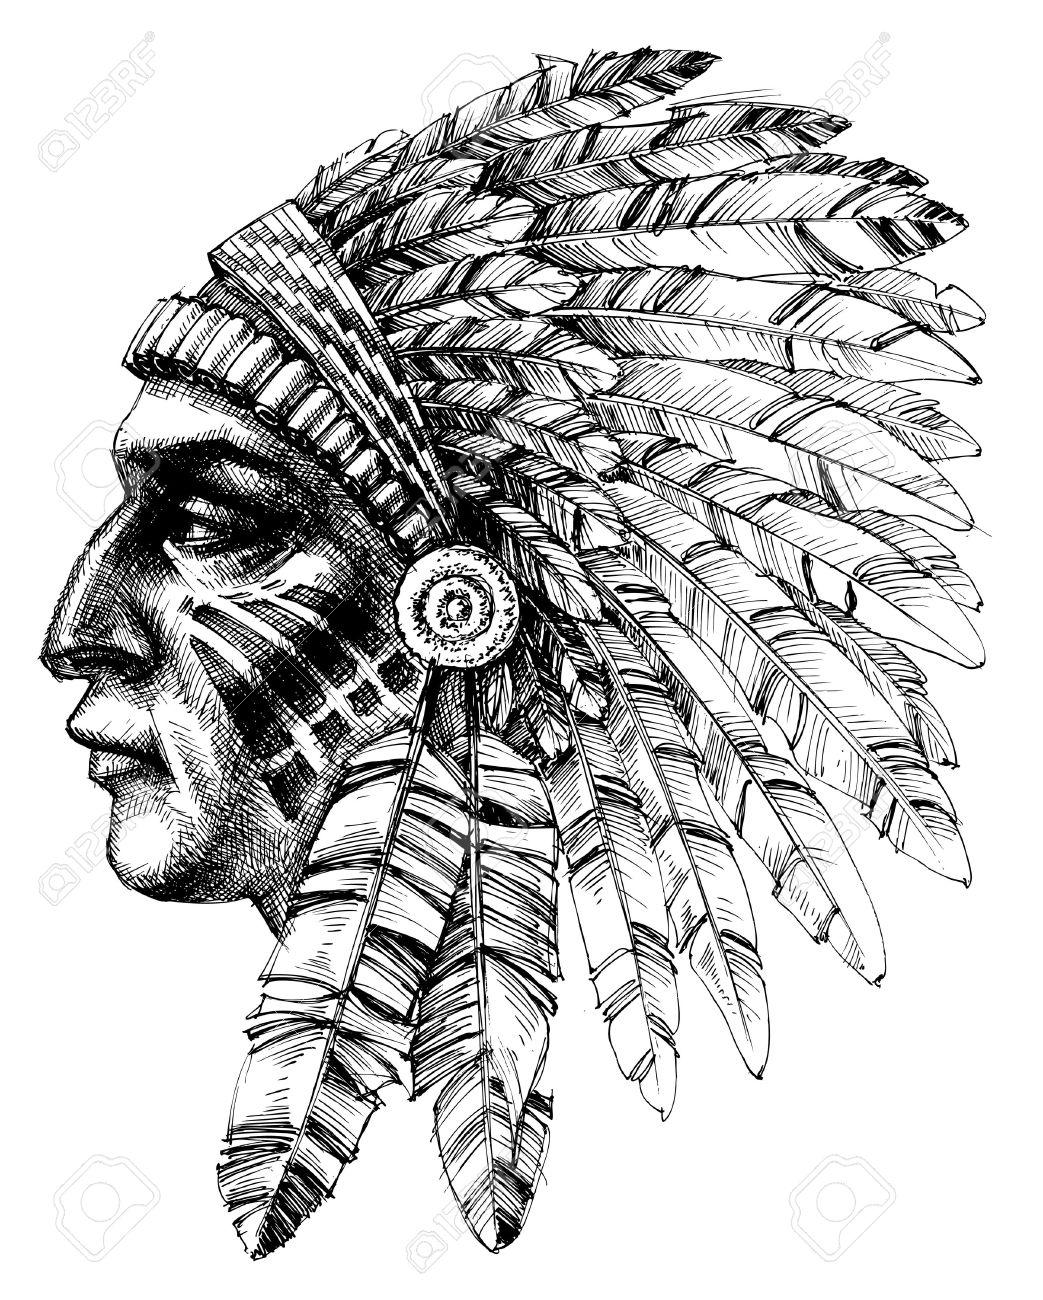 Native american indian warrior profile with war headdress, t-shirt design - 49696602